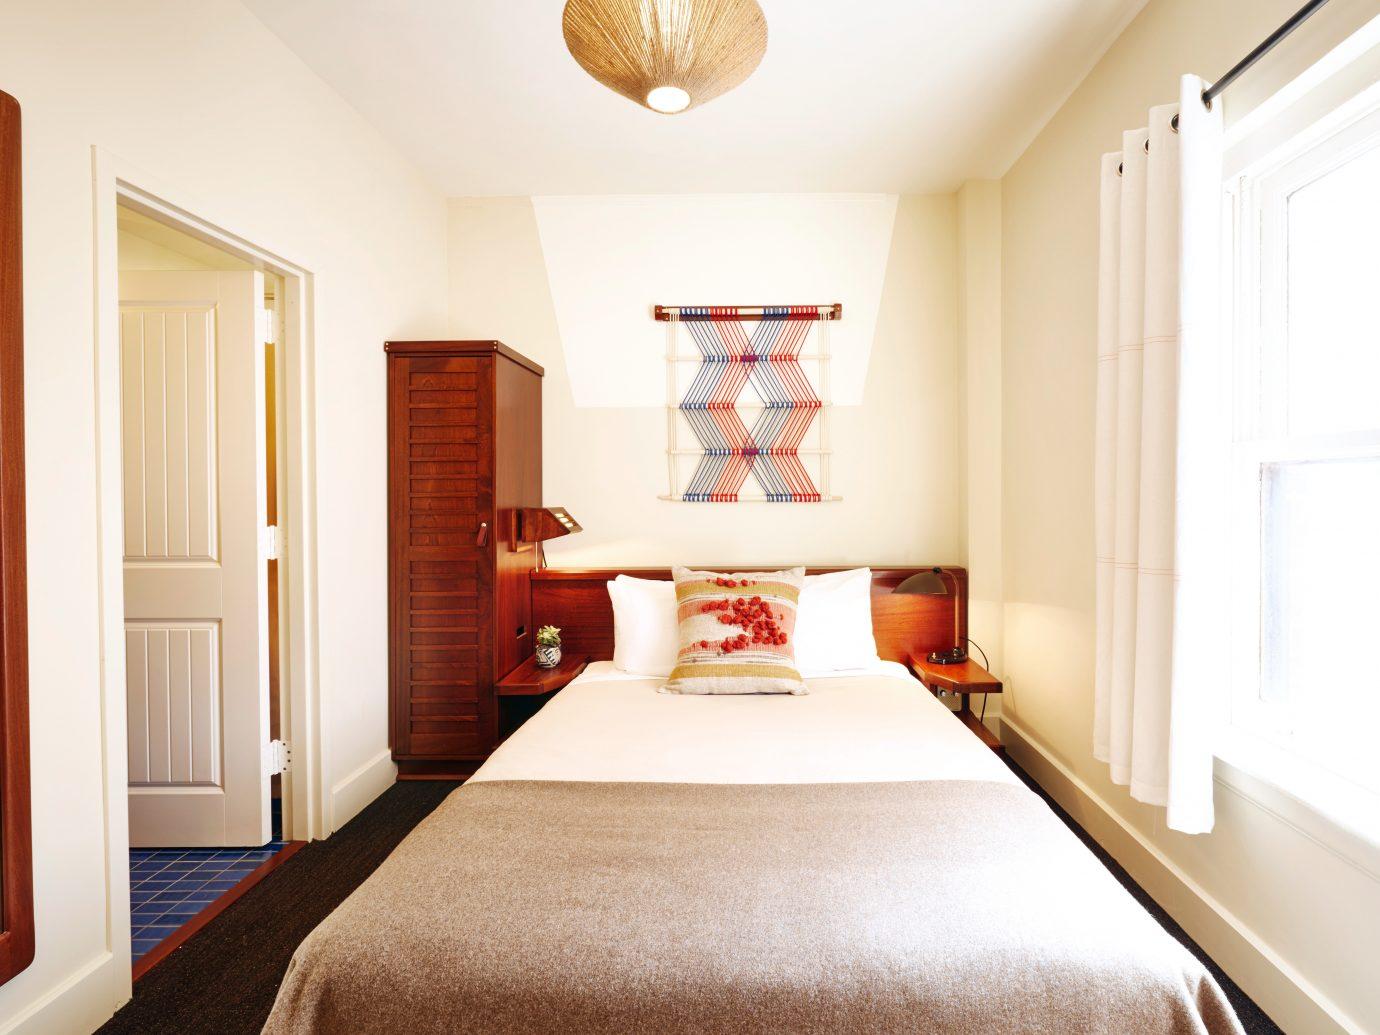 Bedroom Lounge Suite Trip Ideas indoor wall bed floor room property ceiling window home interior design estate living room real estate cottage Design decorated